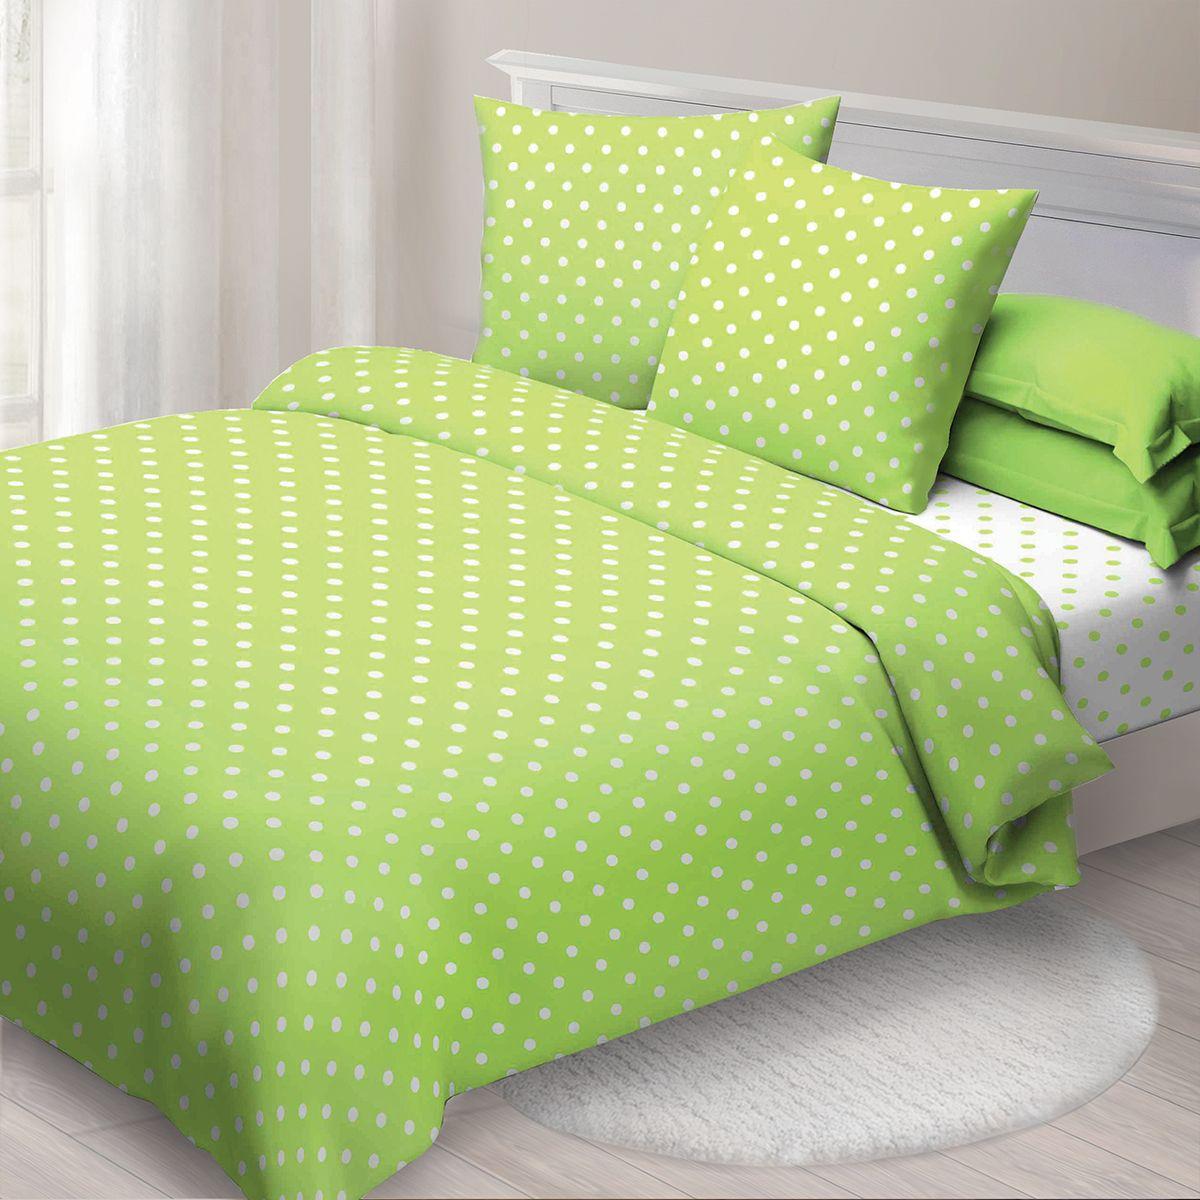 Комплект белья Спал Спалыч Бетти , 2-х спальное, наволочки 70x70, цвет: зеленый. 4080-182450